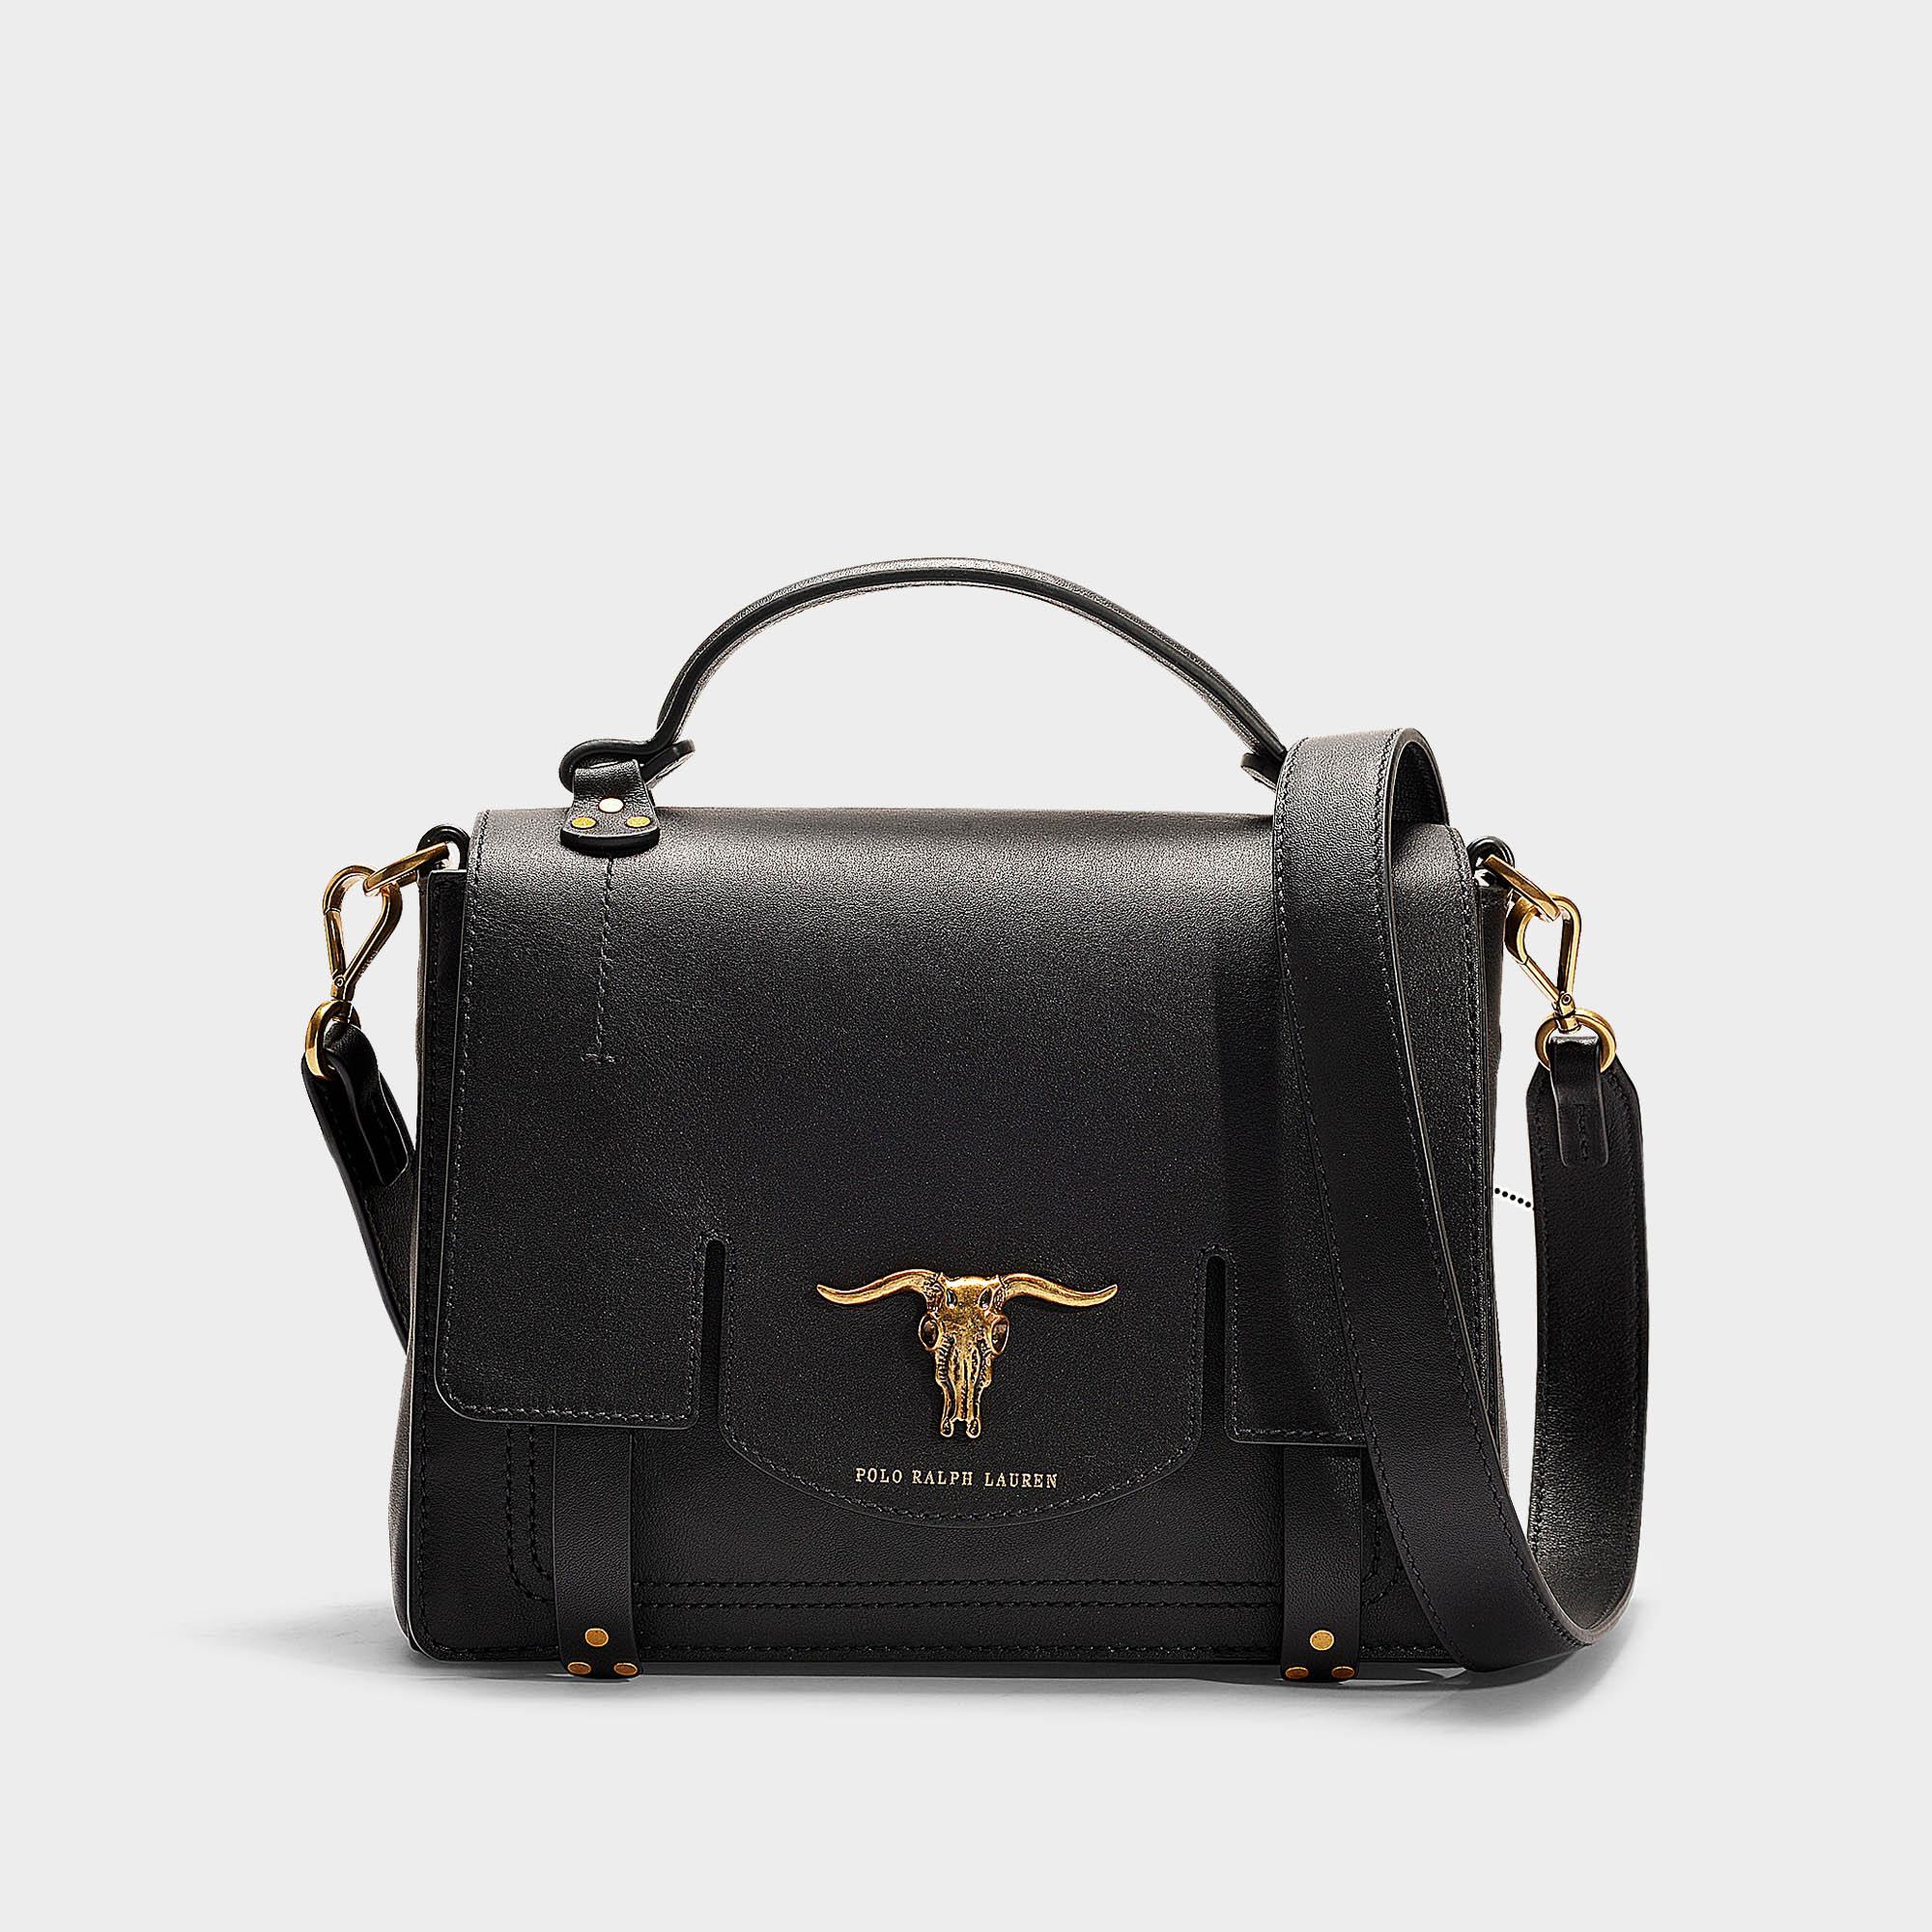 e0b31fab1d Polo Ralph Lauren Schooly Top Handle Small Bag In Black Calfskin in ...